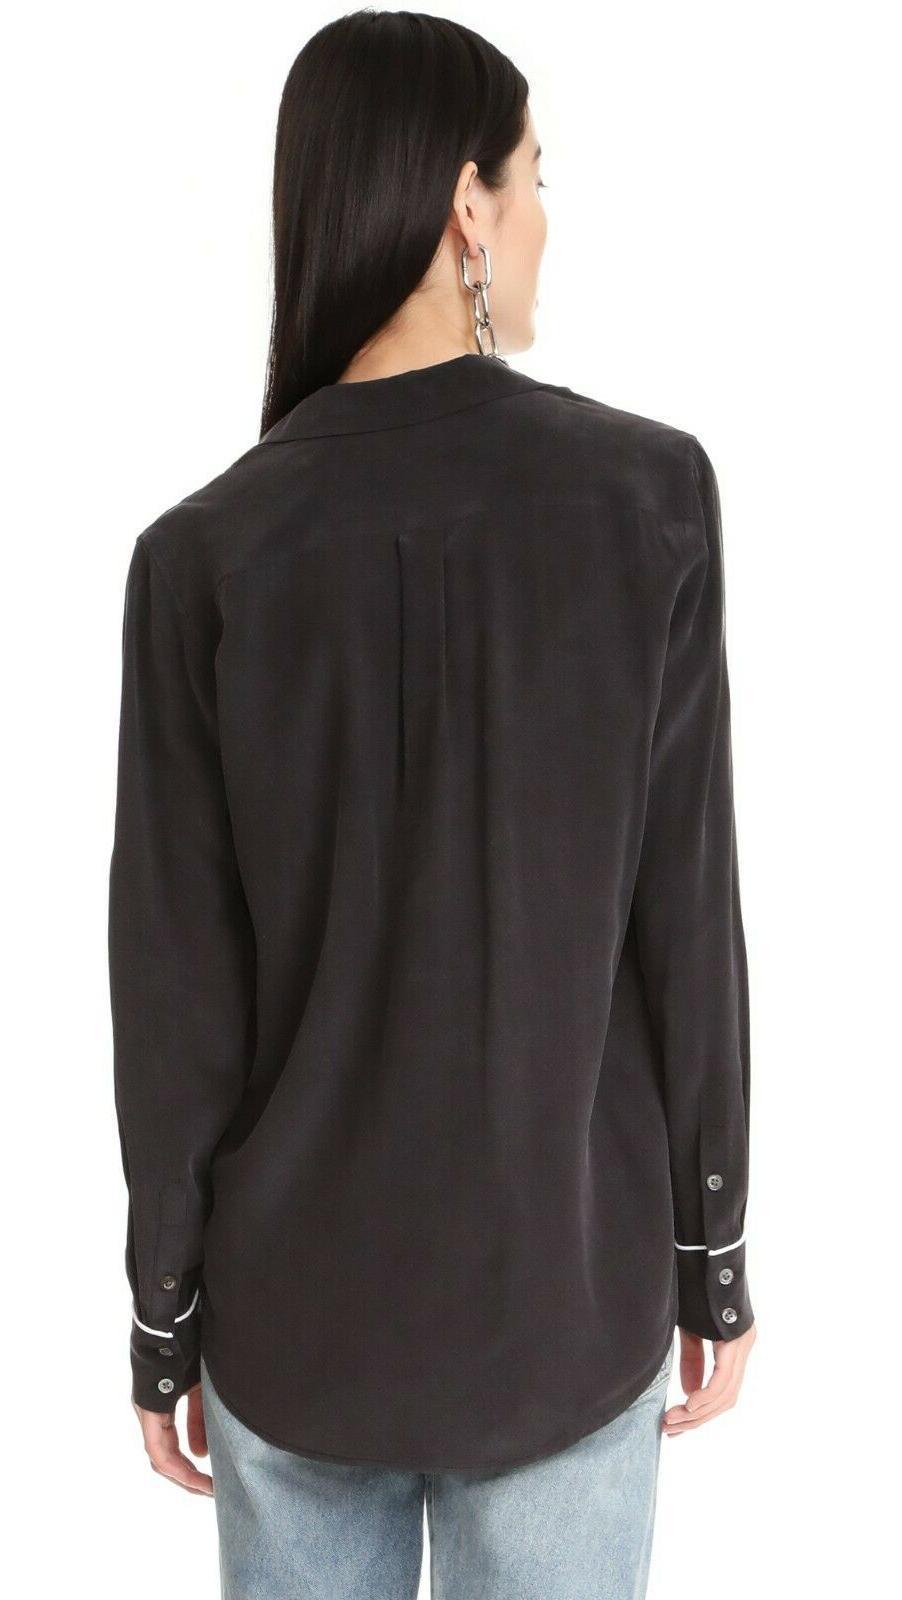 NWT Equipment Shirt Black Size